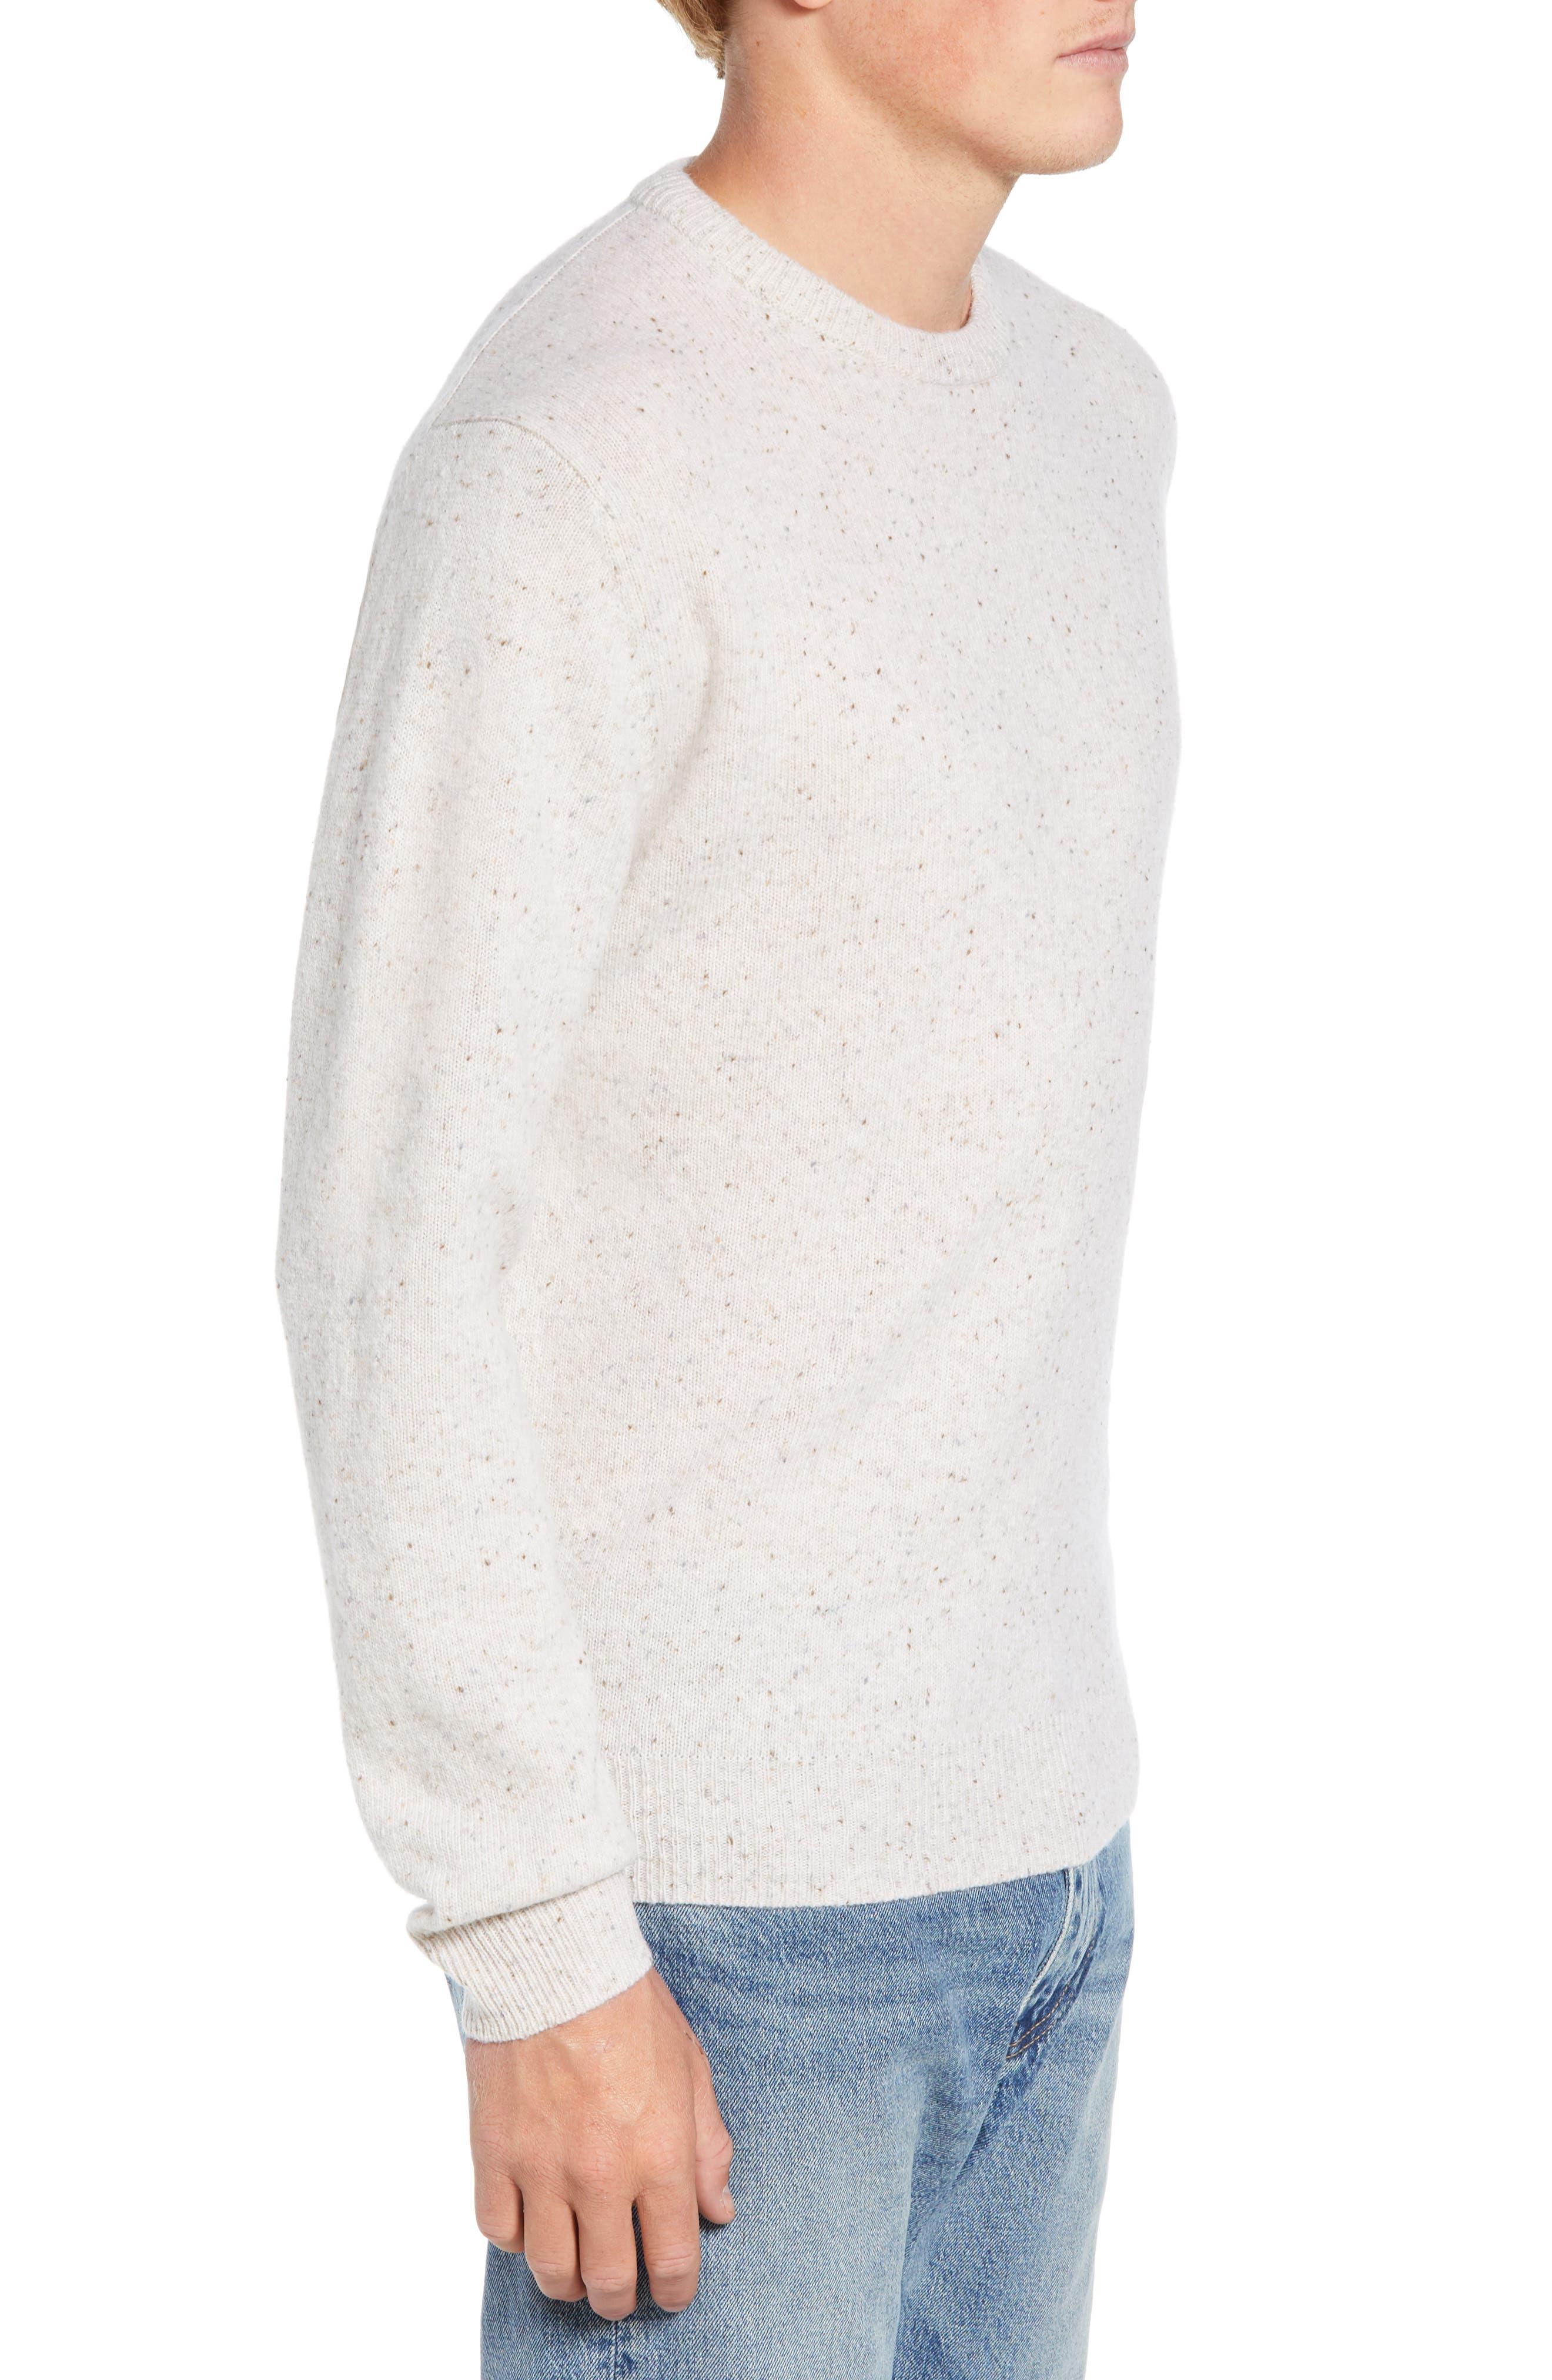 Donegal Sweater,                             Alternate thumbnail 3, color,                             CUBA WHITE